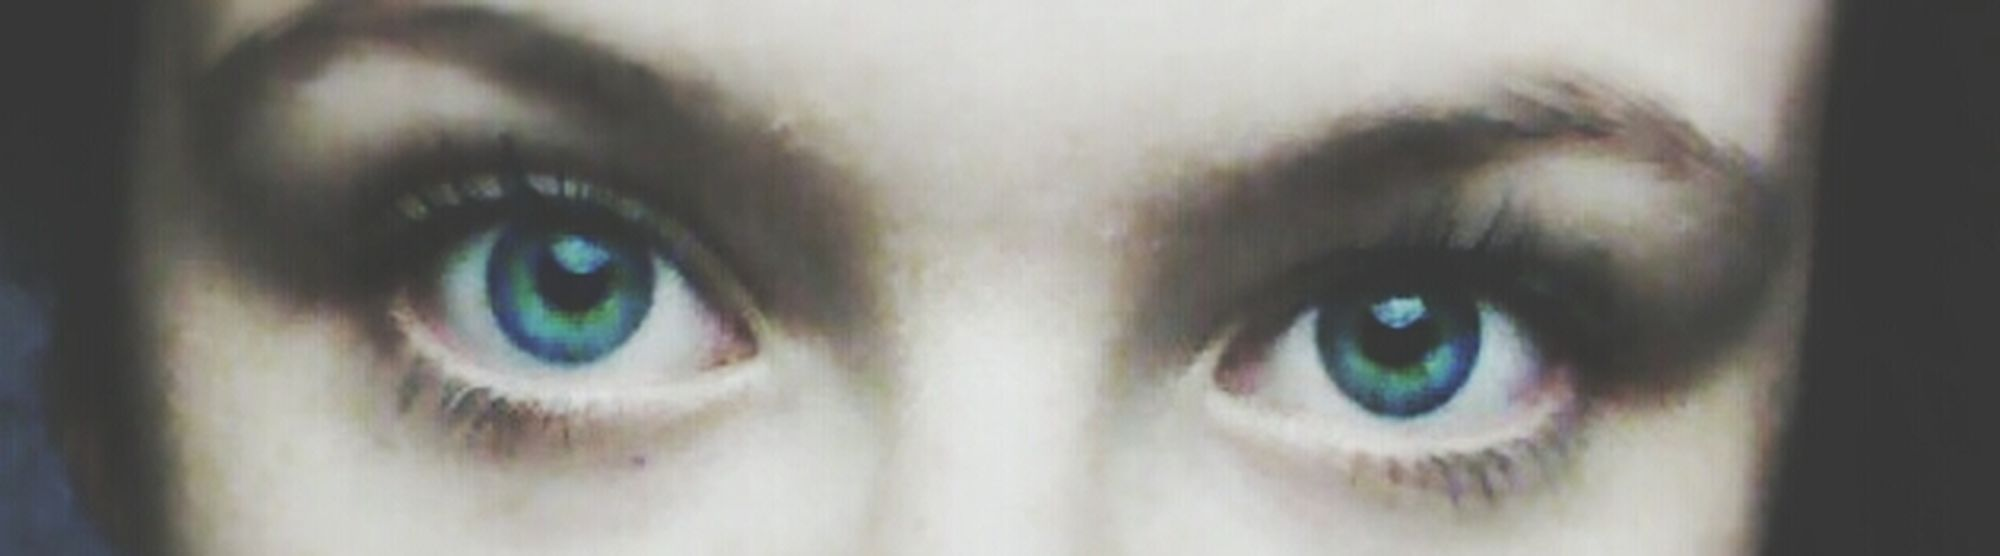 Blue Eyes Itsme Eyebrows Green Eyes